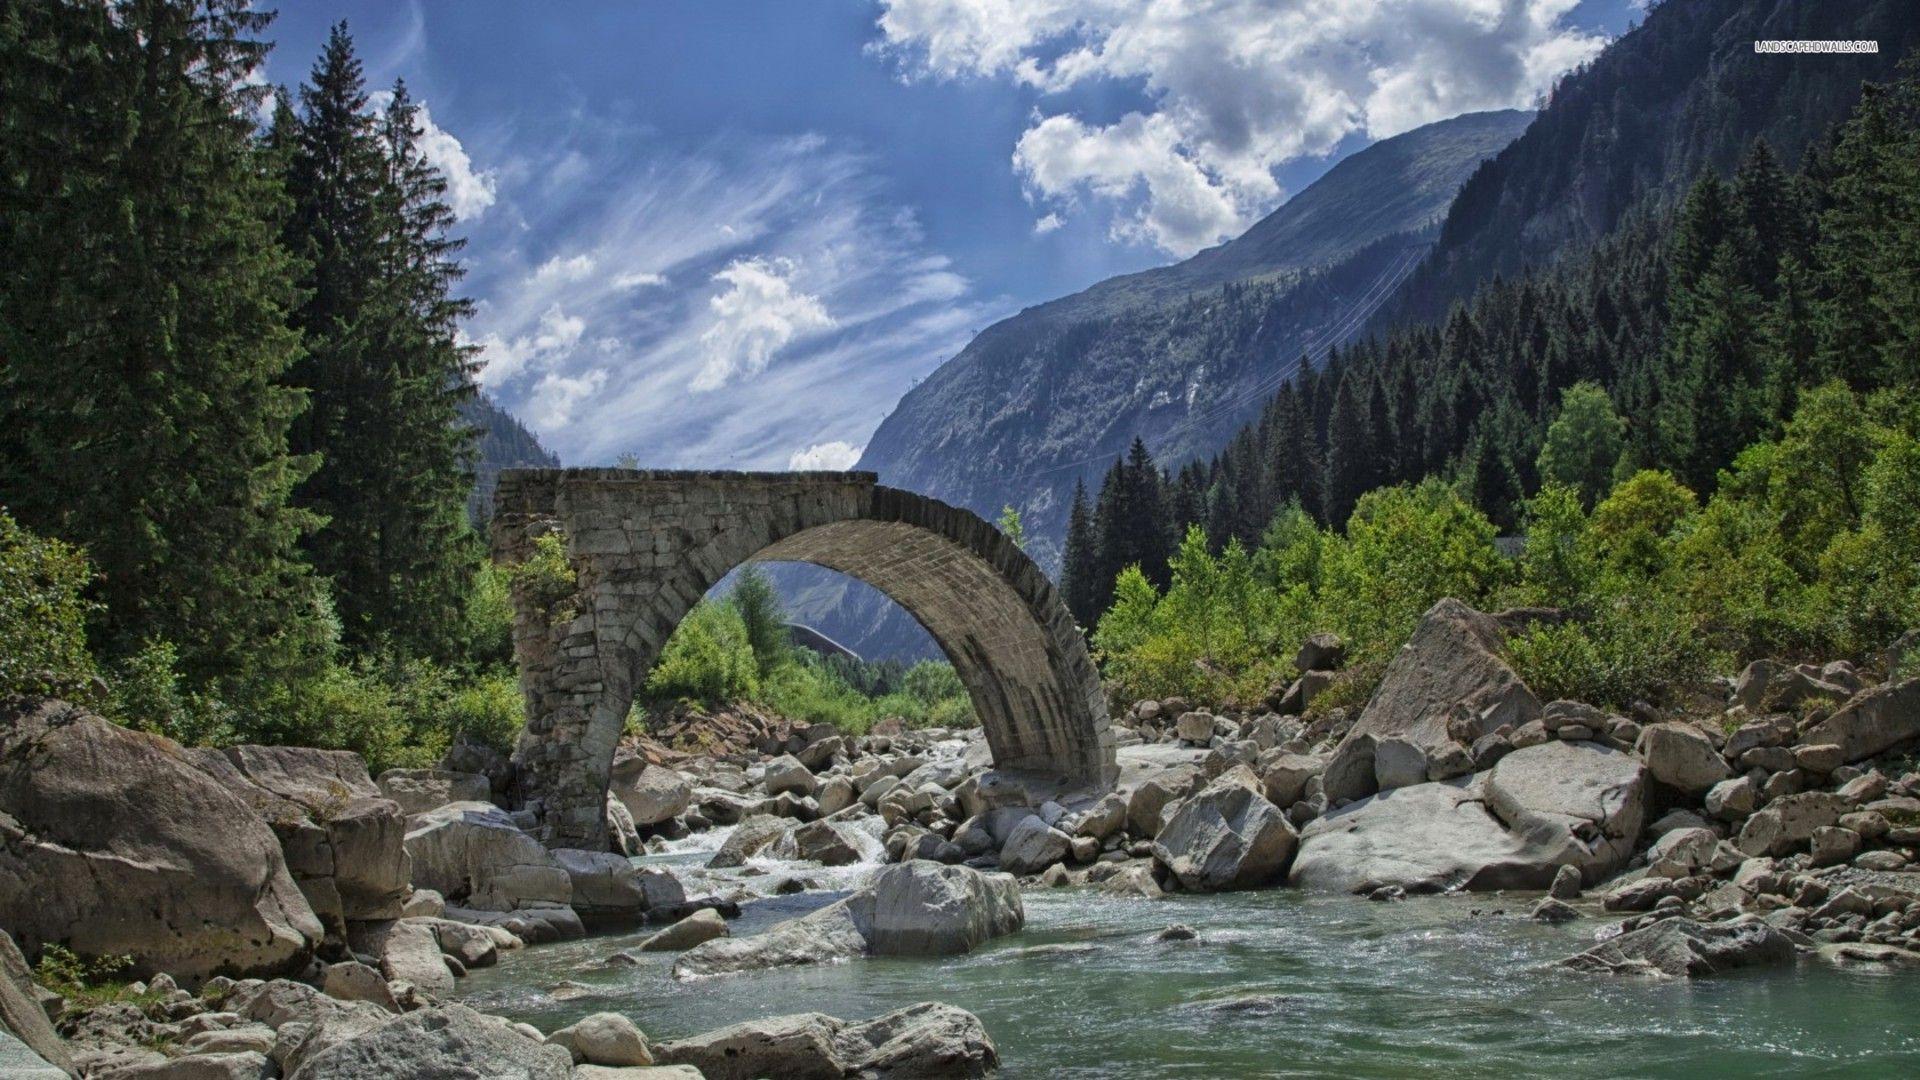 Bridge ruins in the valley 5330 1920x1080